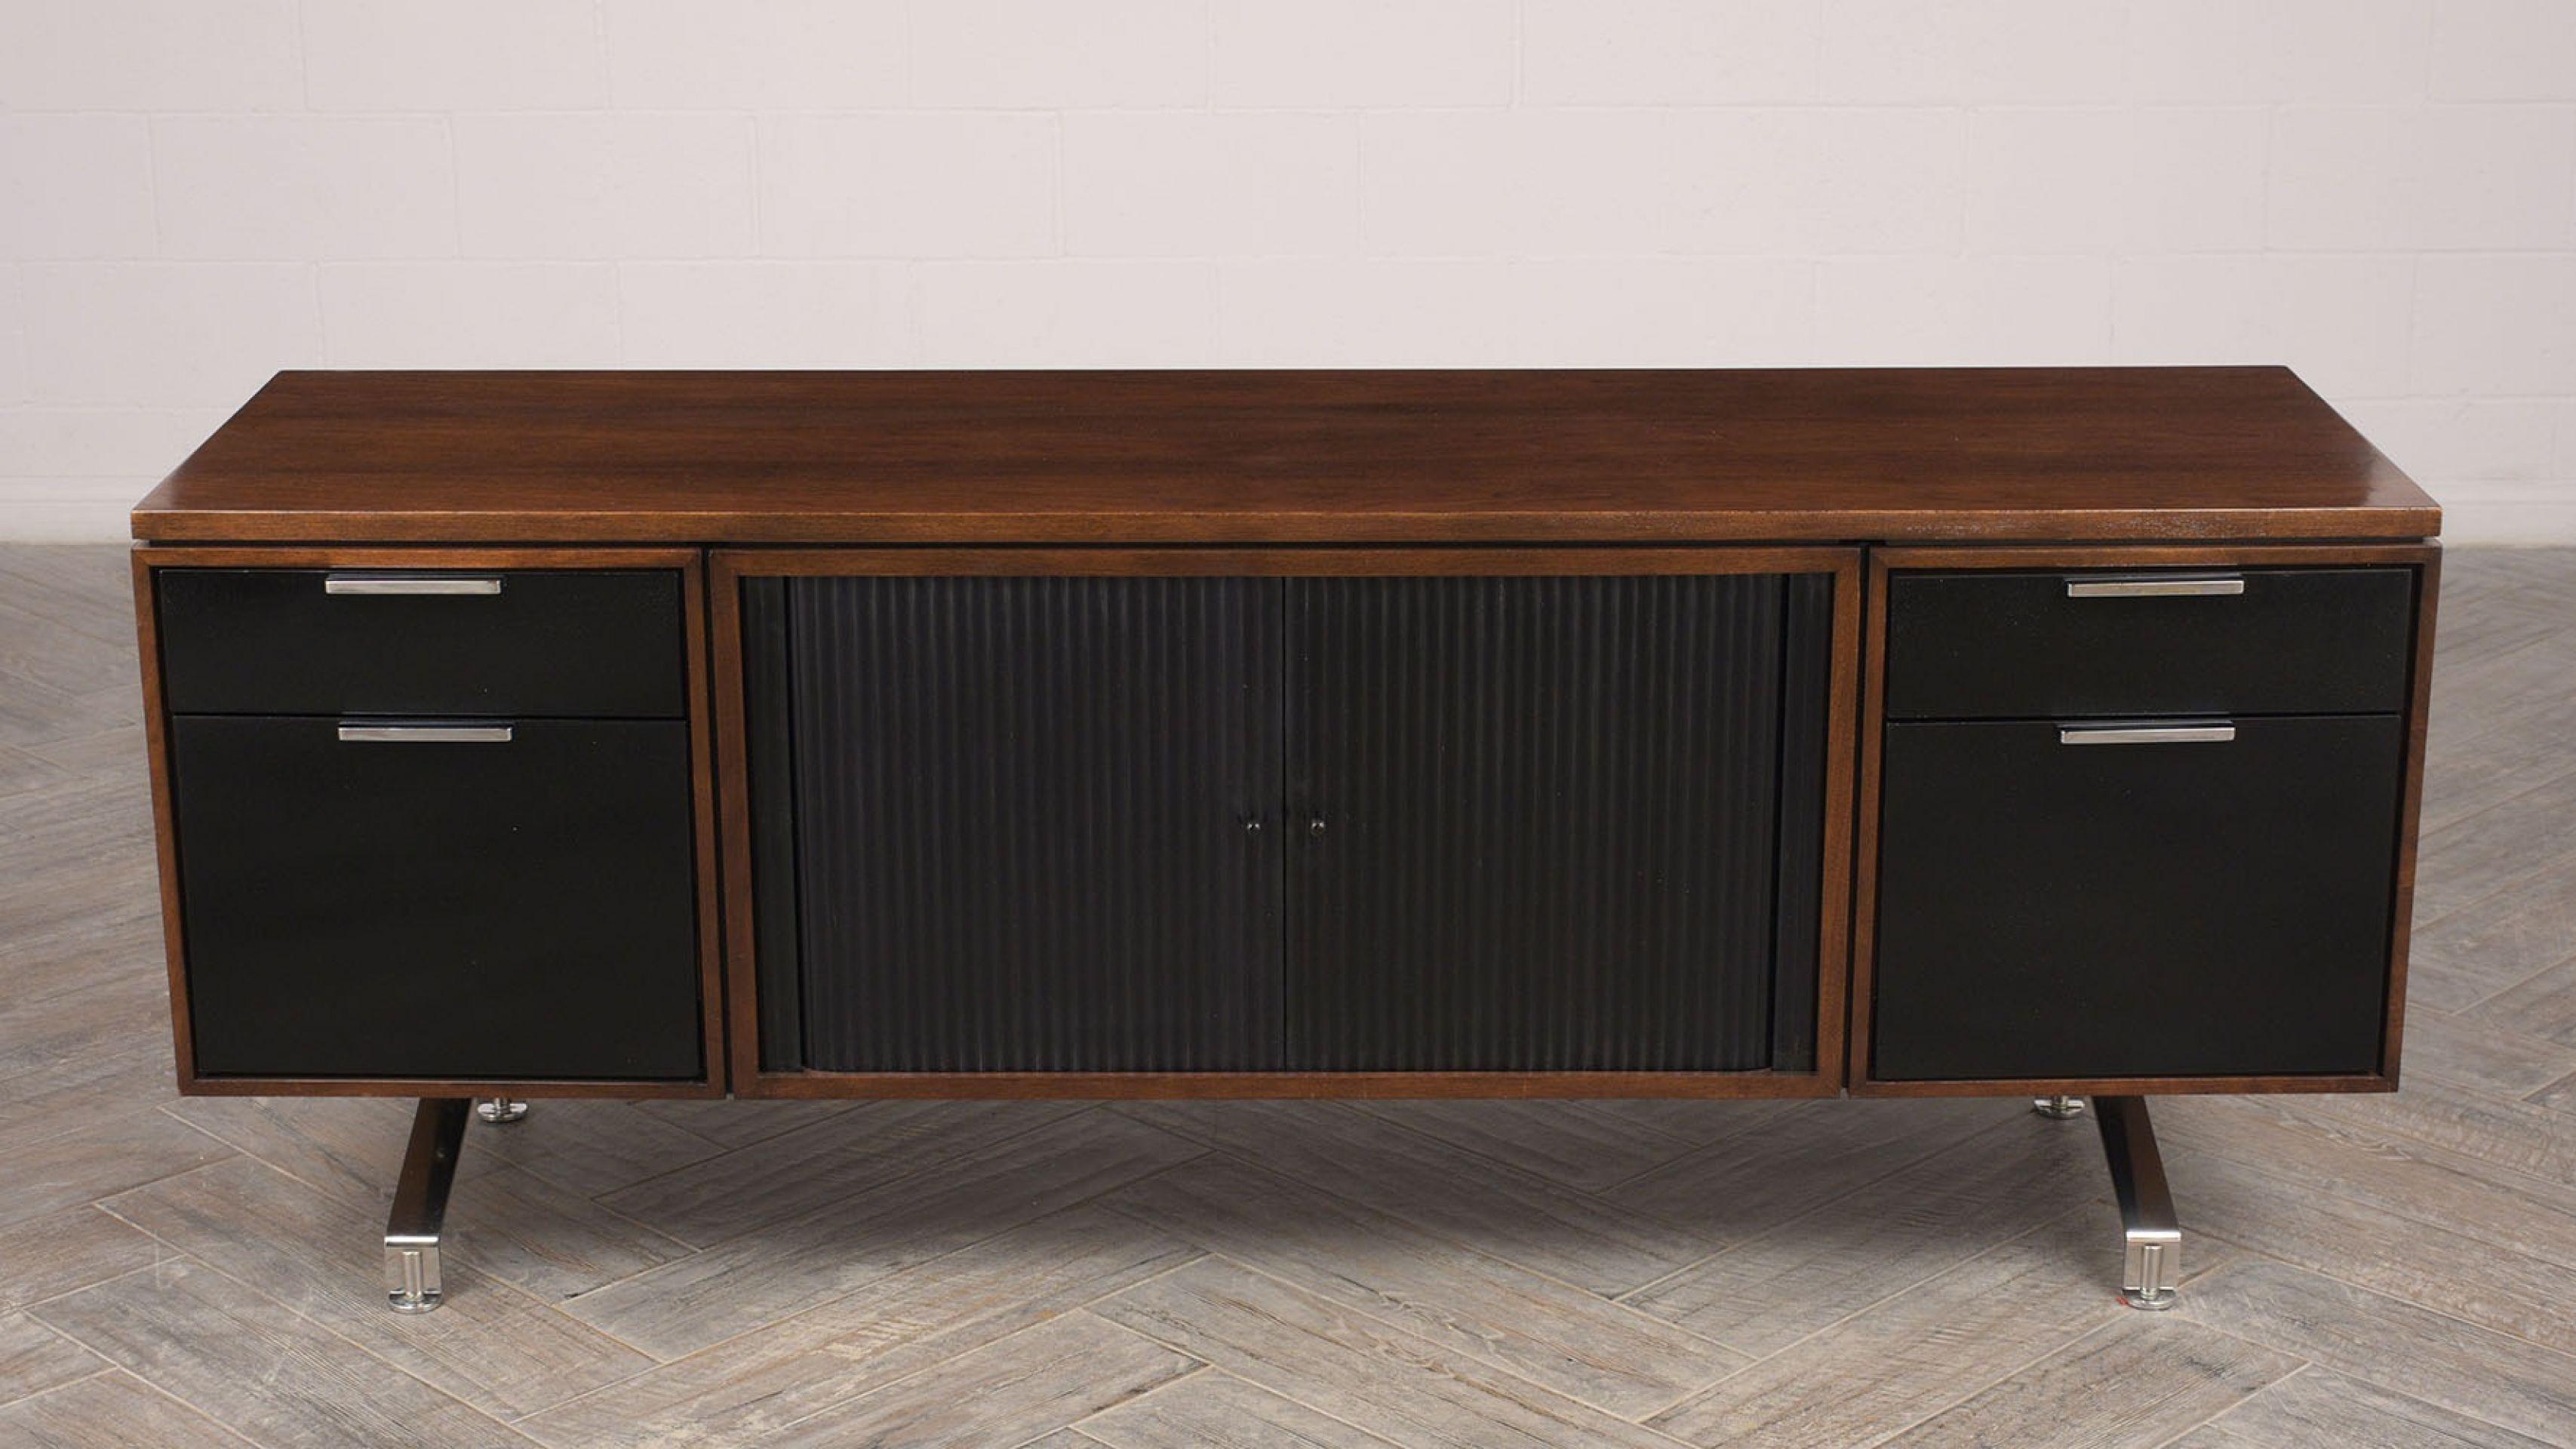 1960's Modern Walnut Credenza with Sliding Tambour Doors